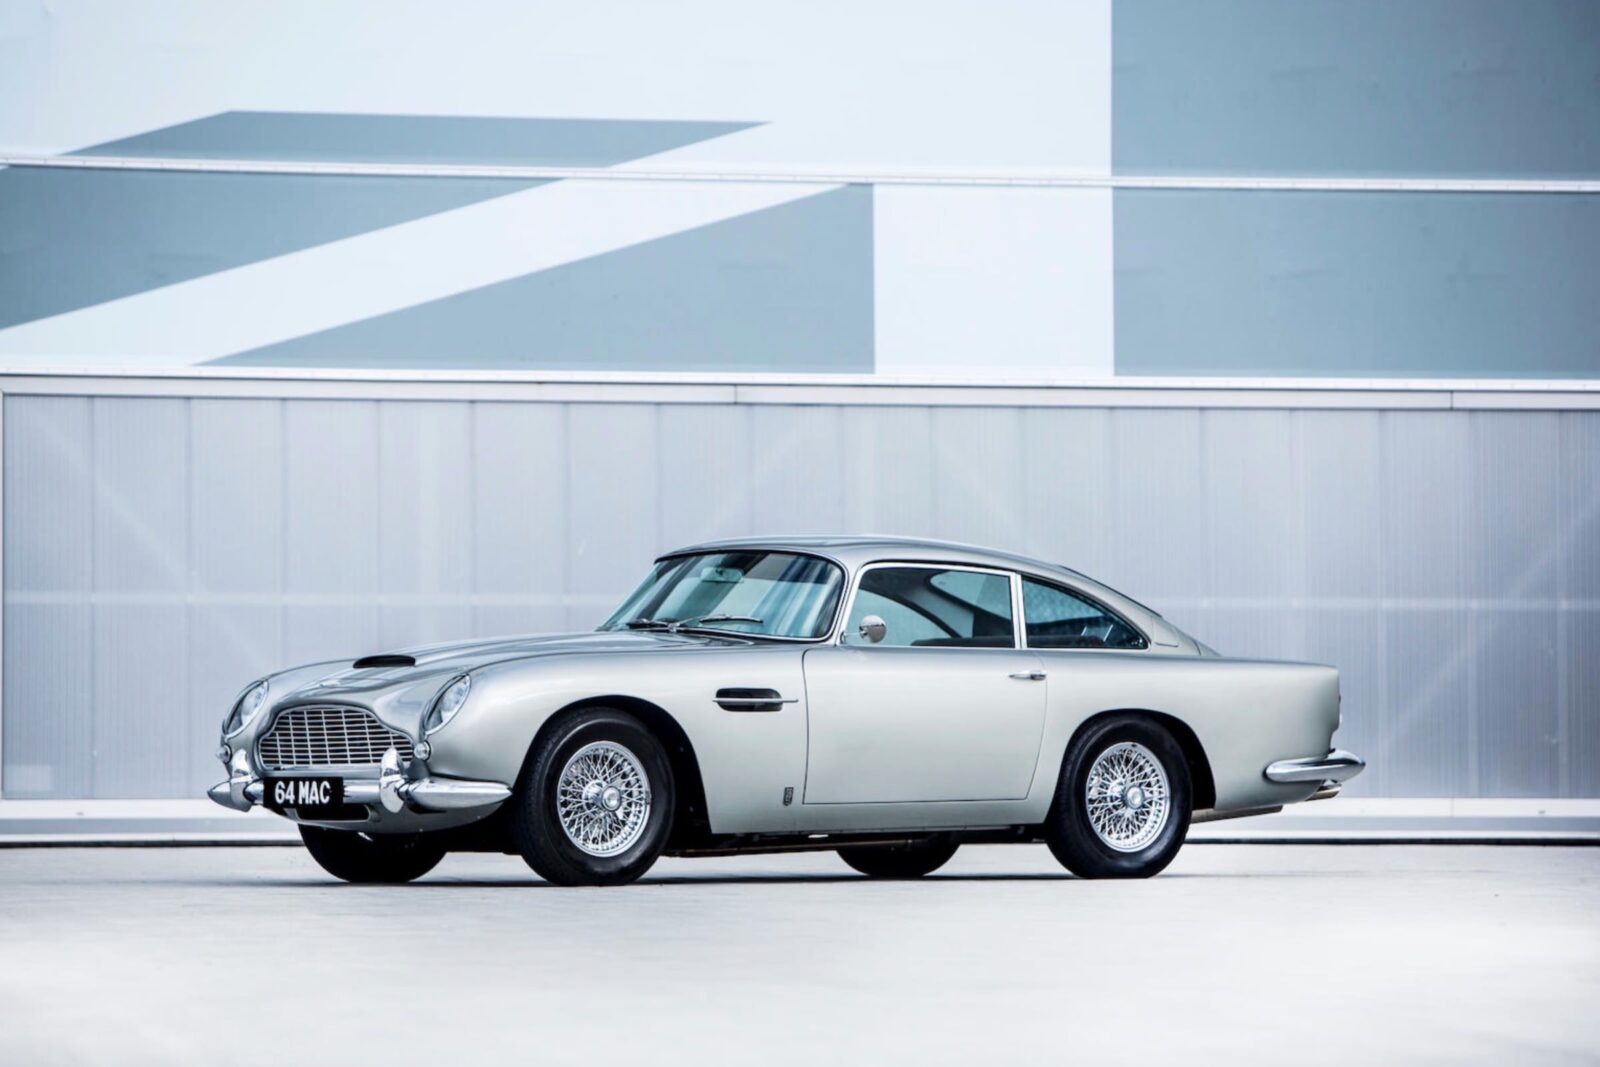 aston martin db5 car 21 1600x1067 - Paul McCartney's Aston Martin DB5